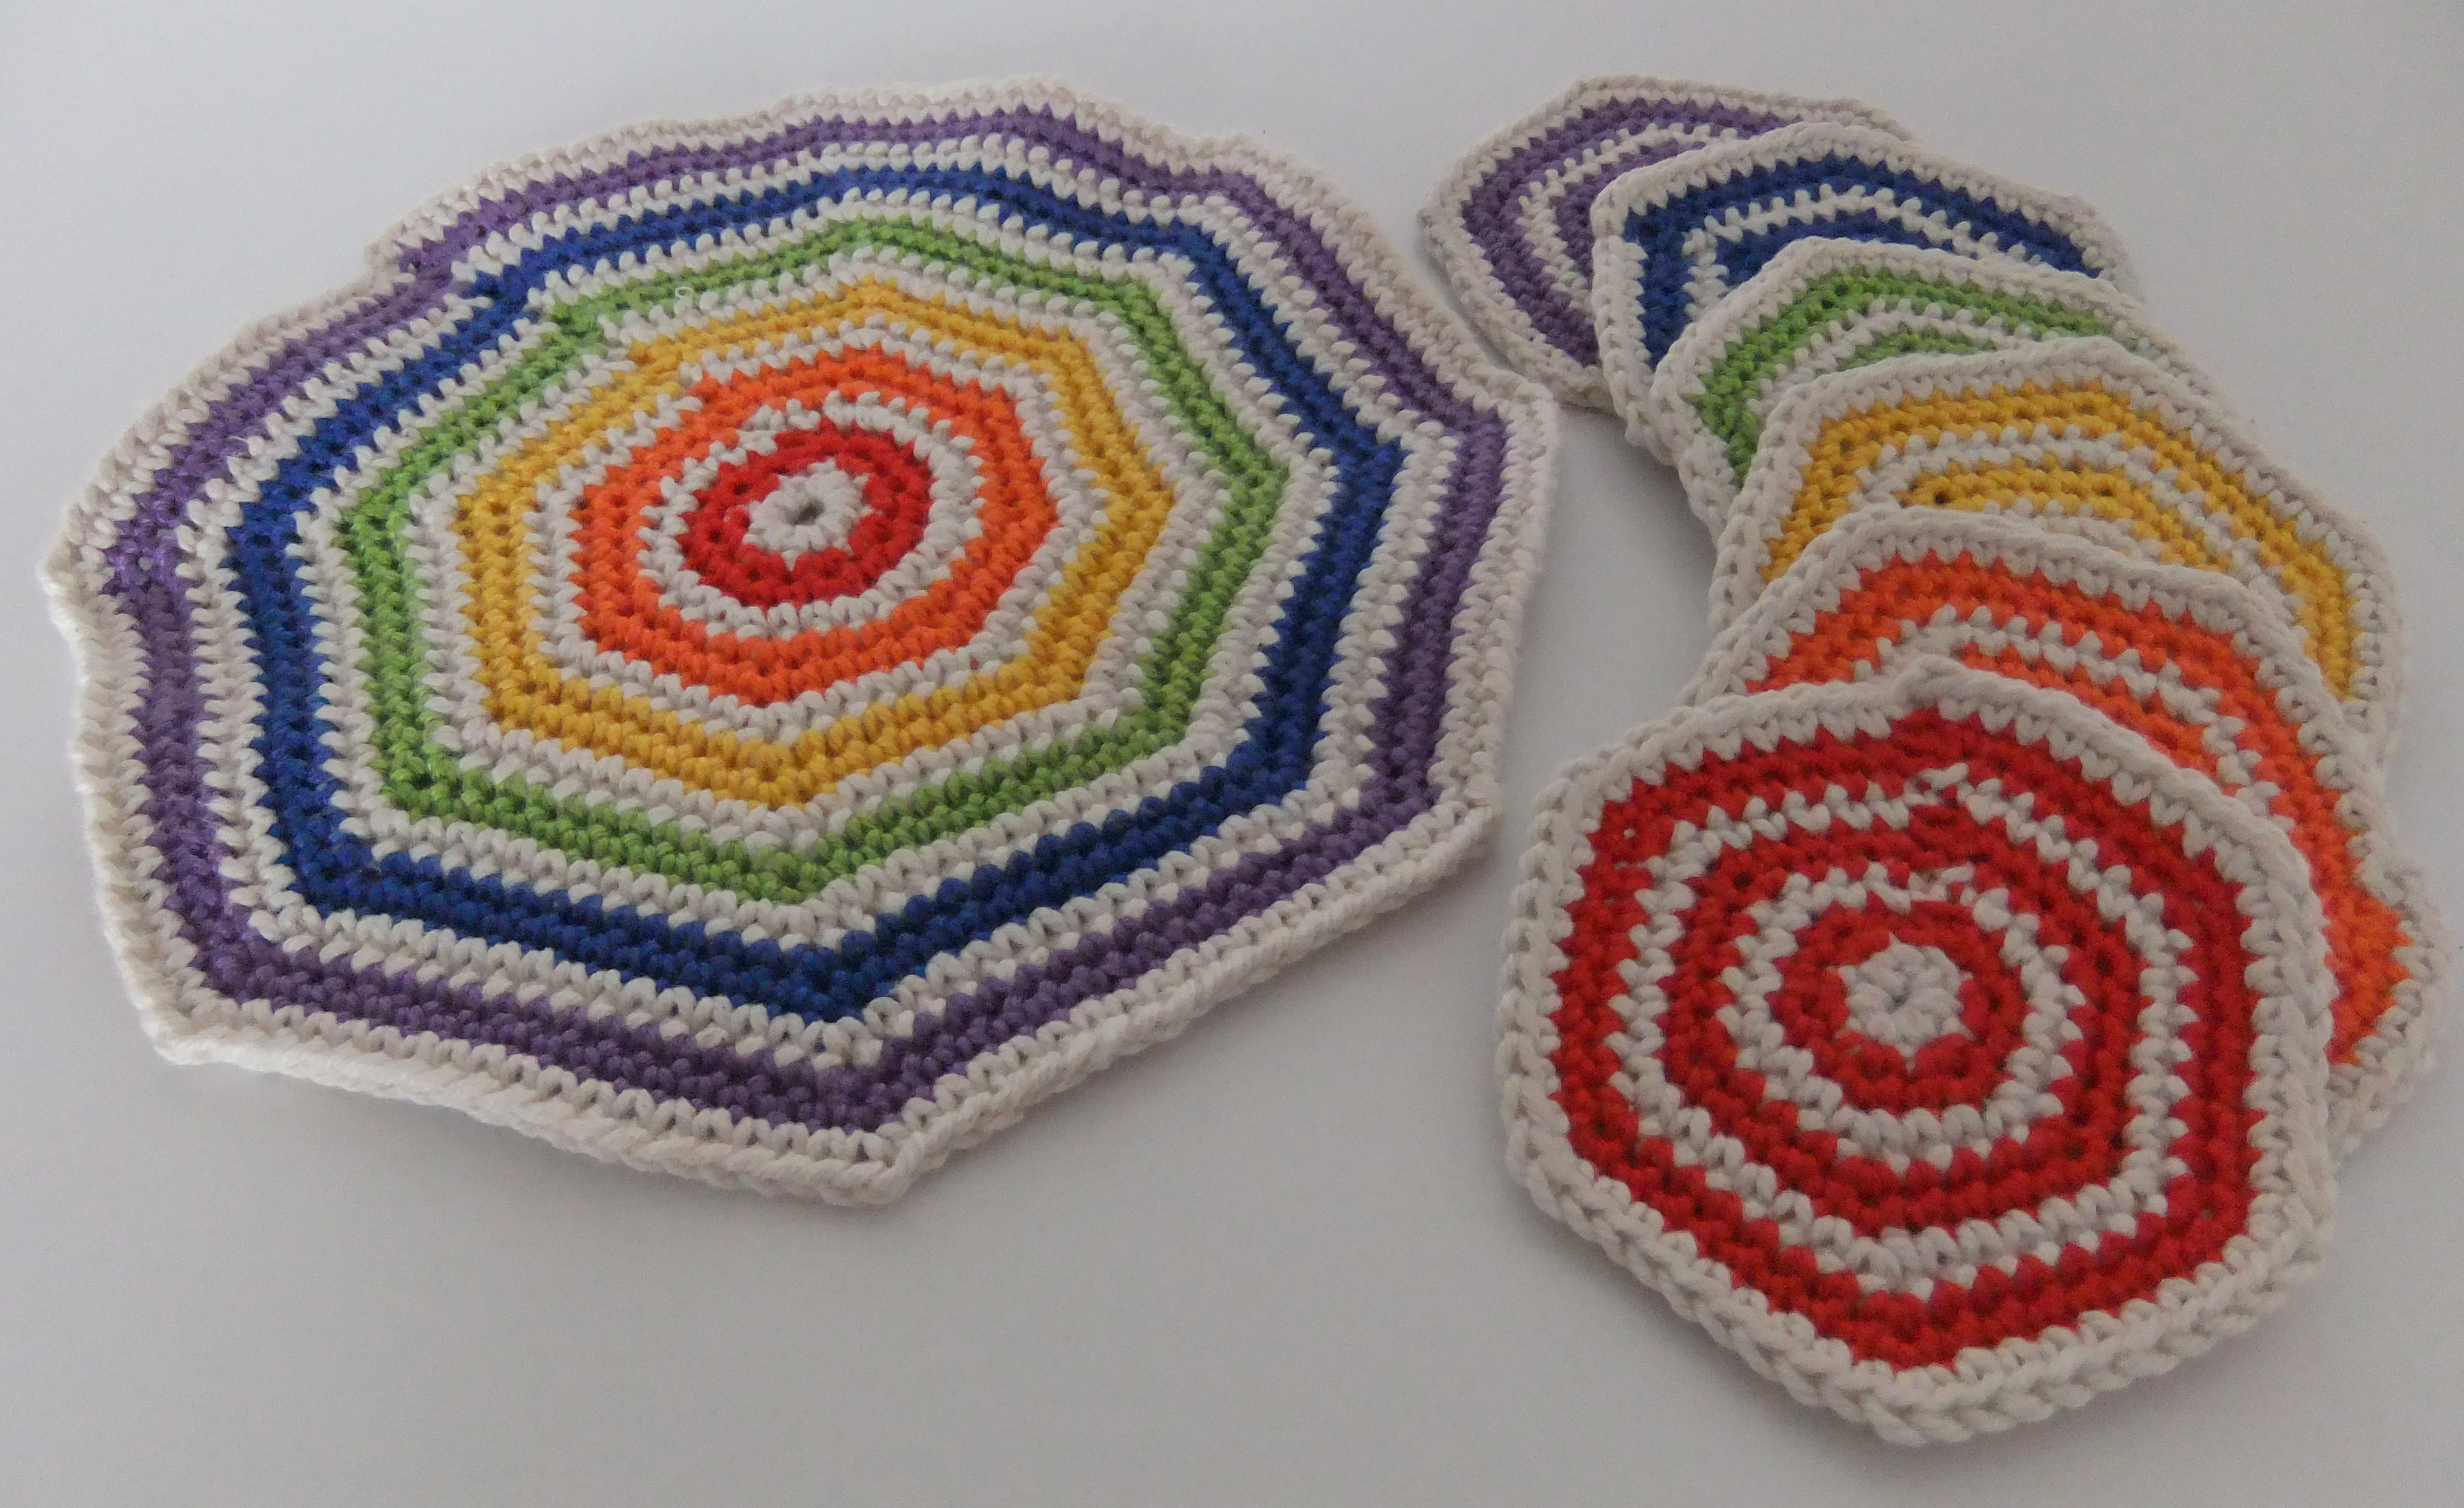 Free Online Crochet Patterns For Coasters : Drinks Coaster Set Crochet Pattern (III) Flickr - Photo ...